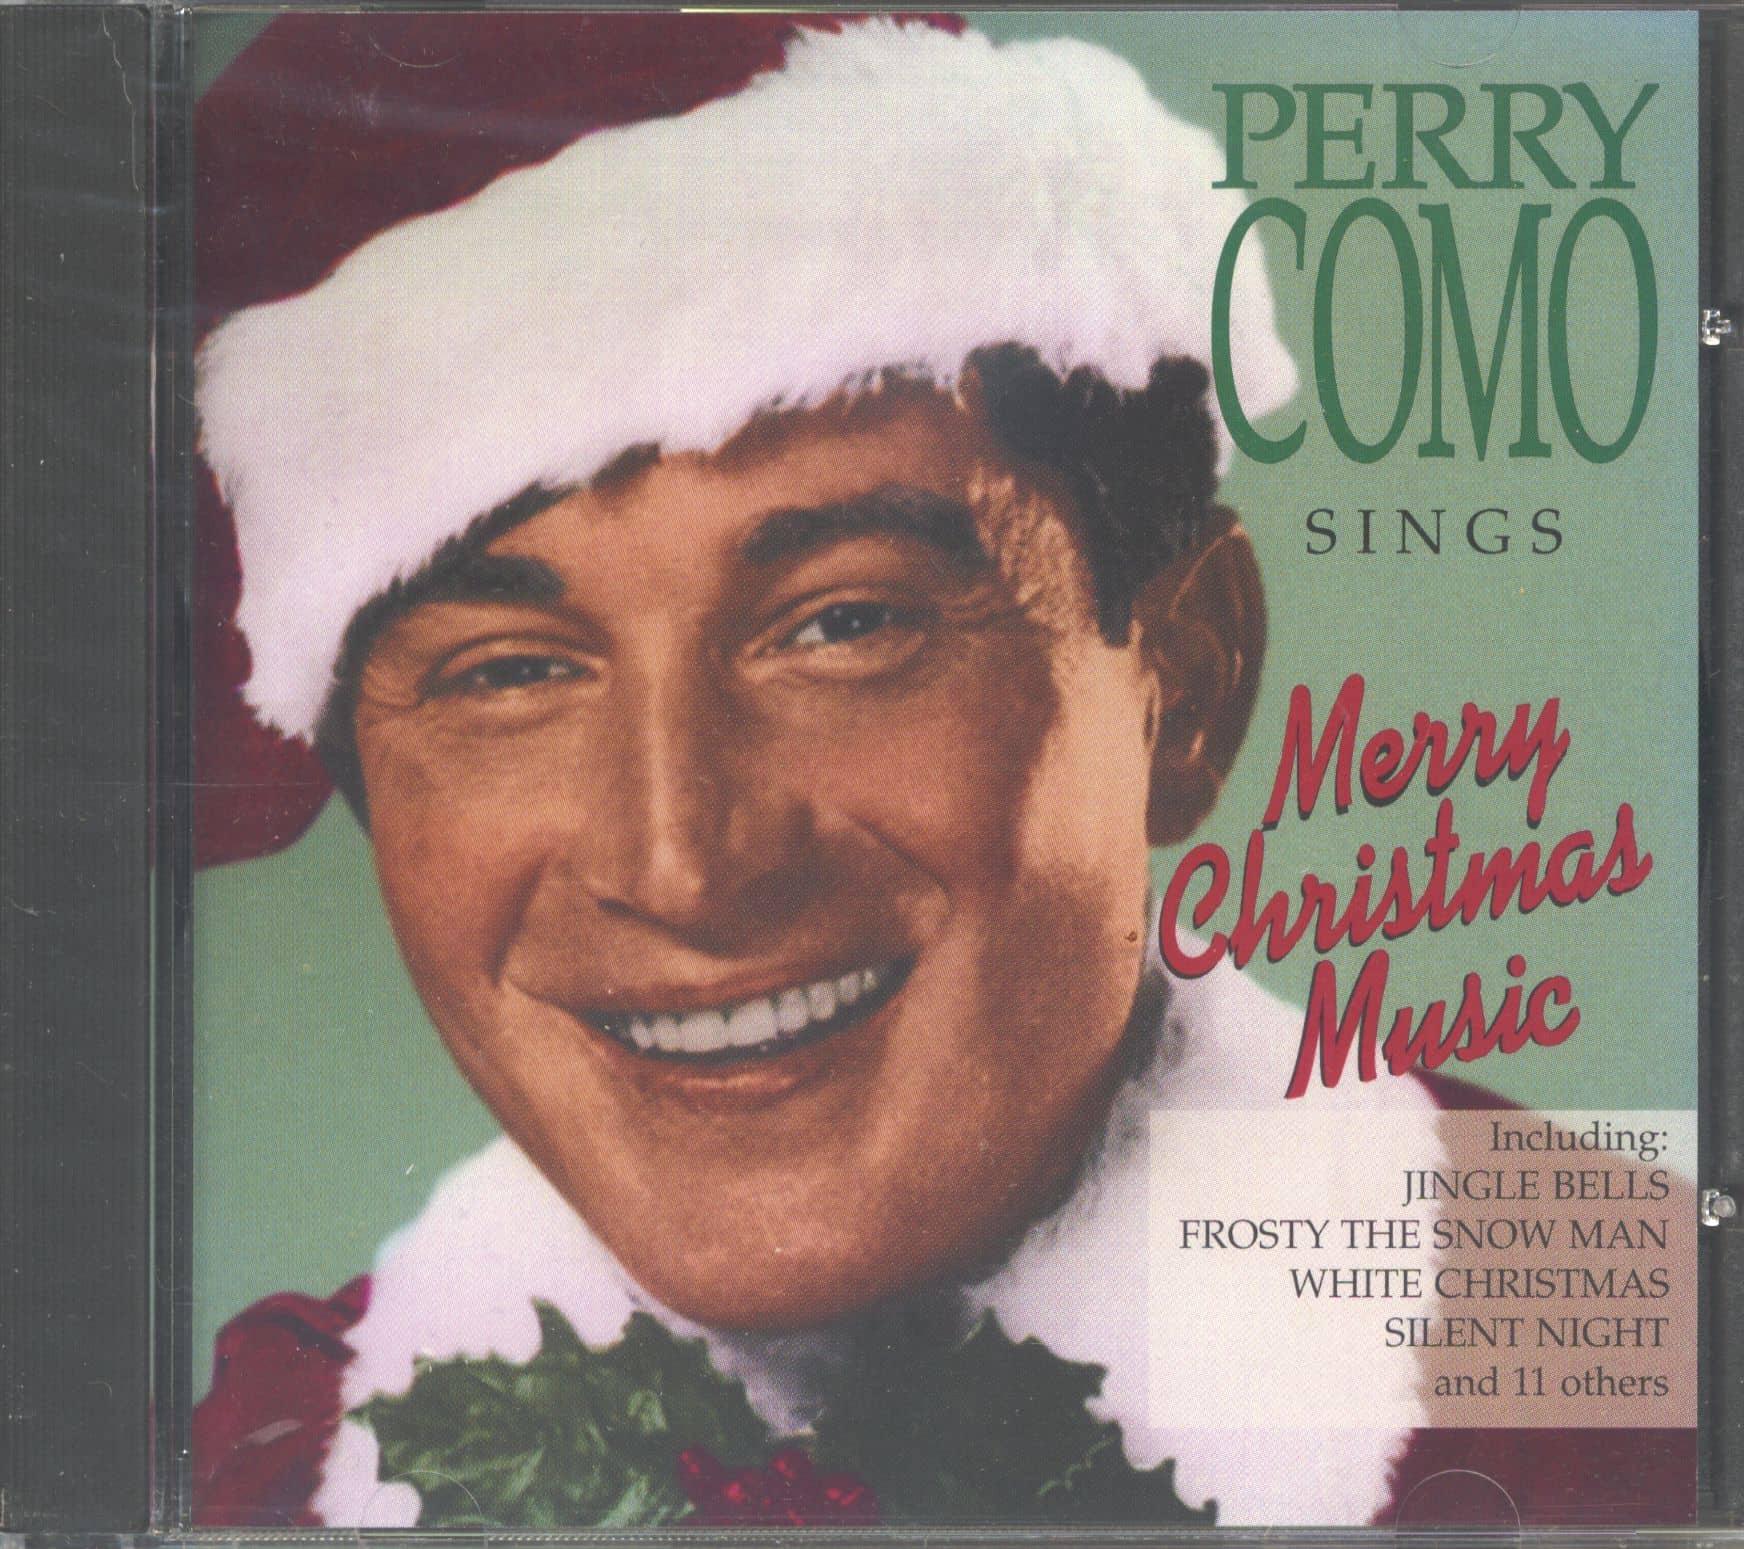 Perry Como CD: Perry Como Sings Merry Christmas Music (CD) - Bear Family Records